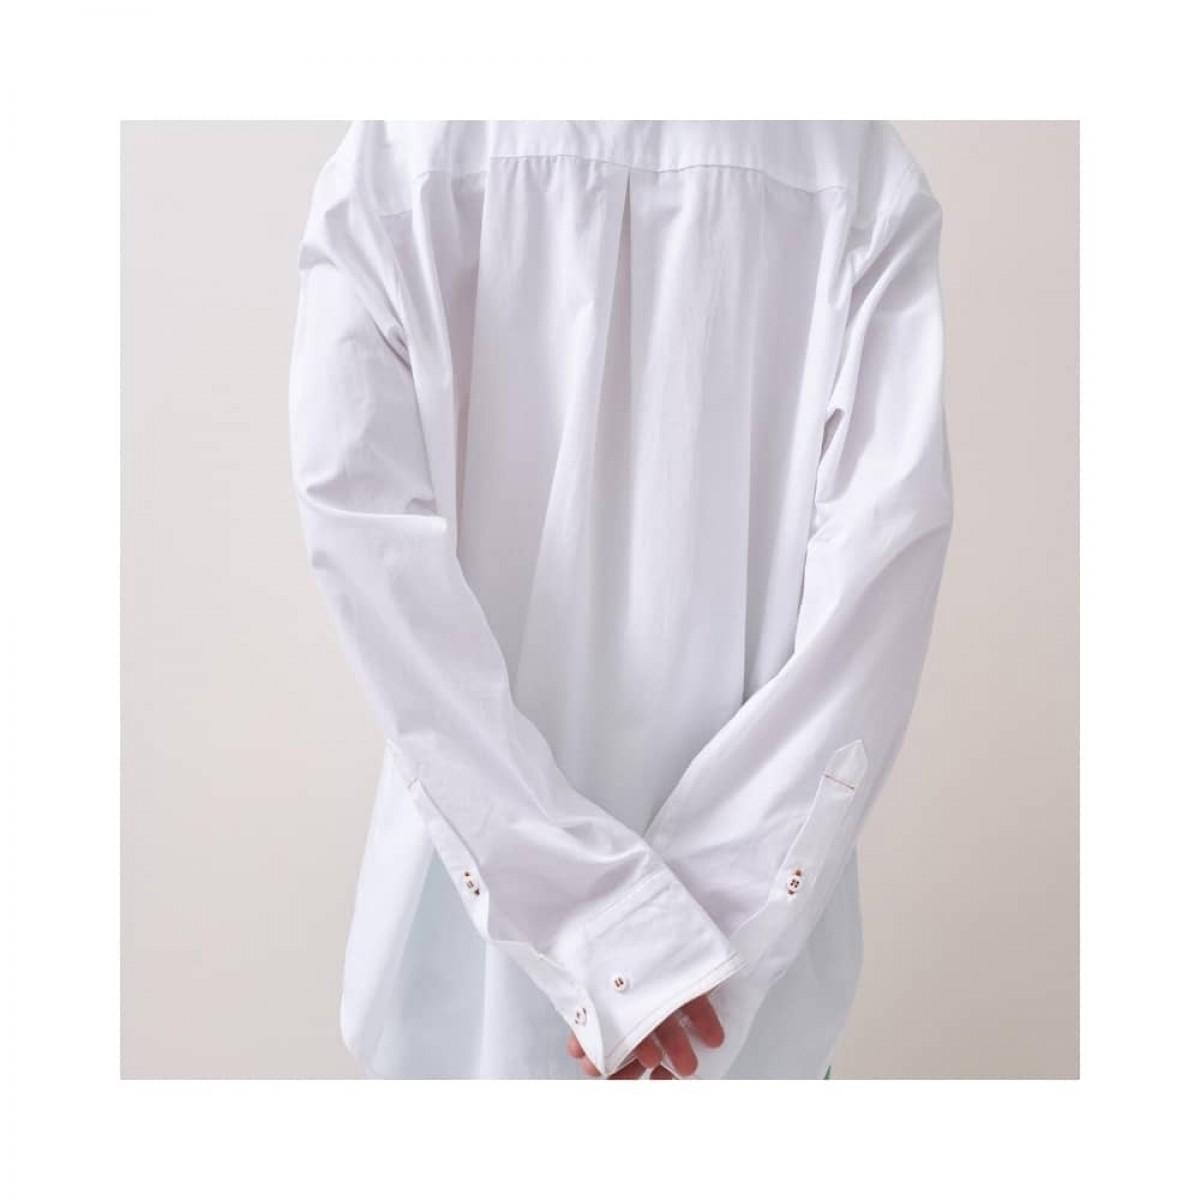 kiara skjorte - white - model ryg